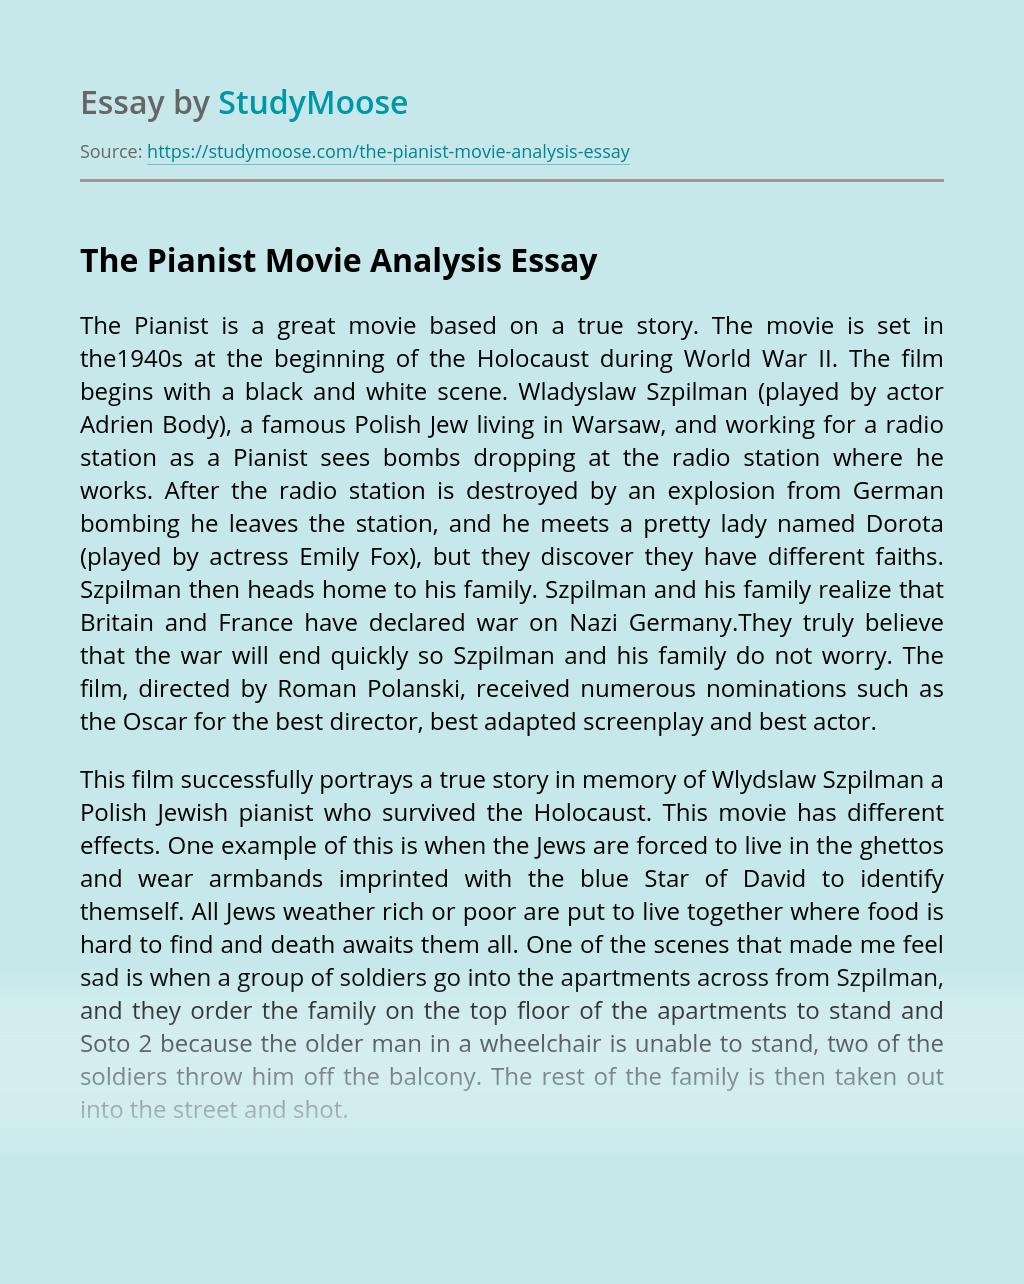 The Pianist Movie Analysis